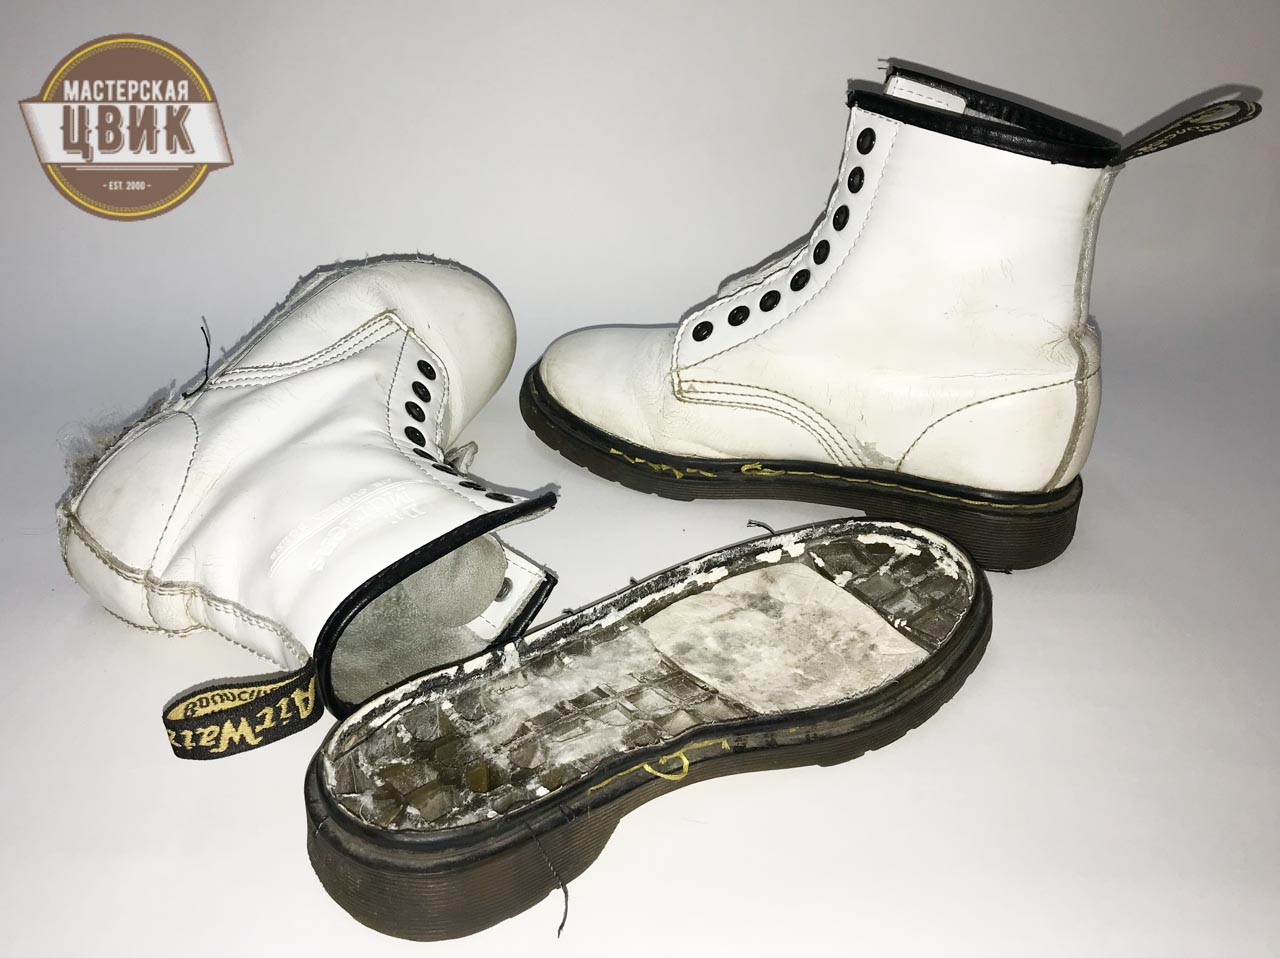 individualnyj-poshiv-obuvi-minsk-52 Индивидуальный пошив обуви Минск-52